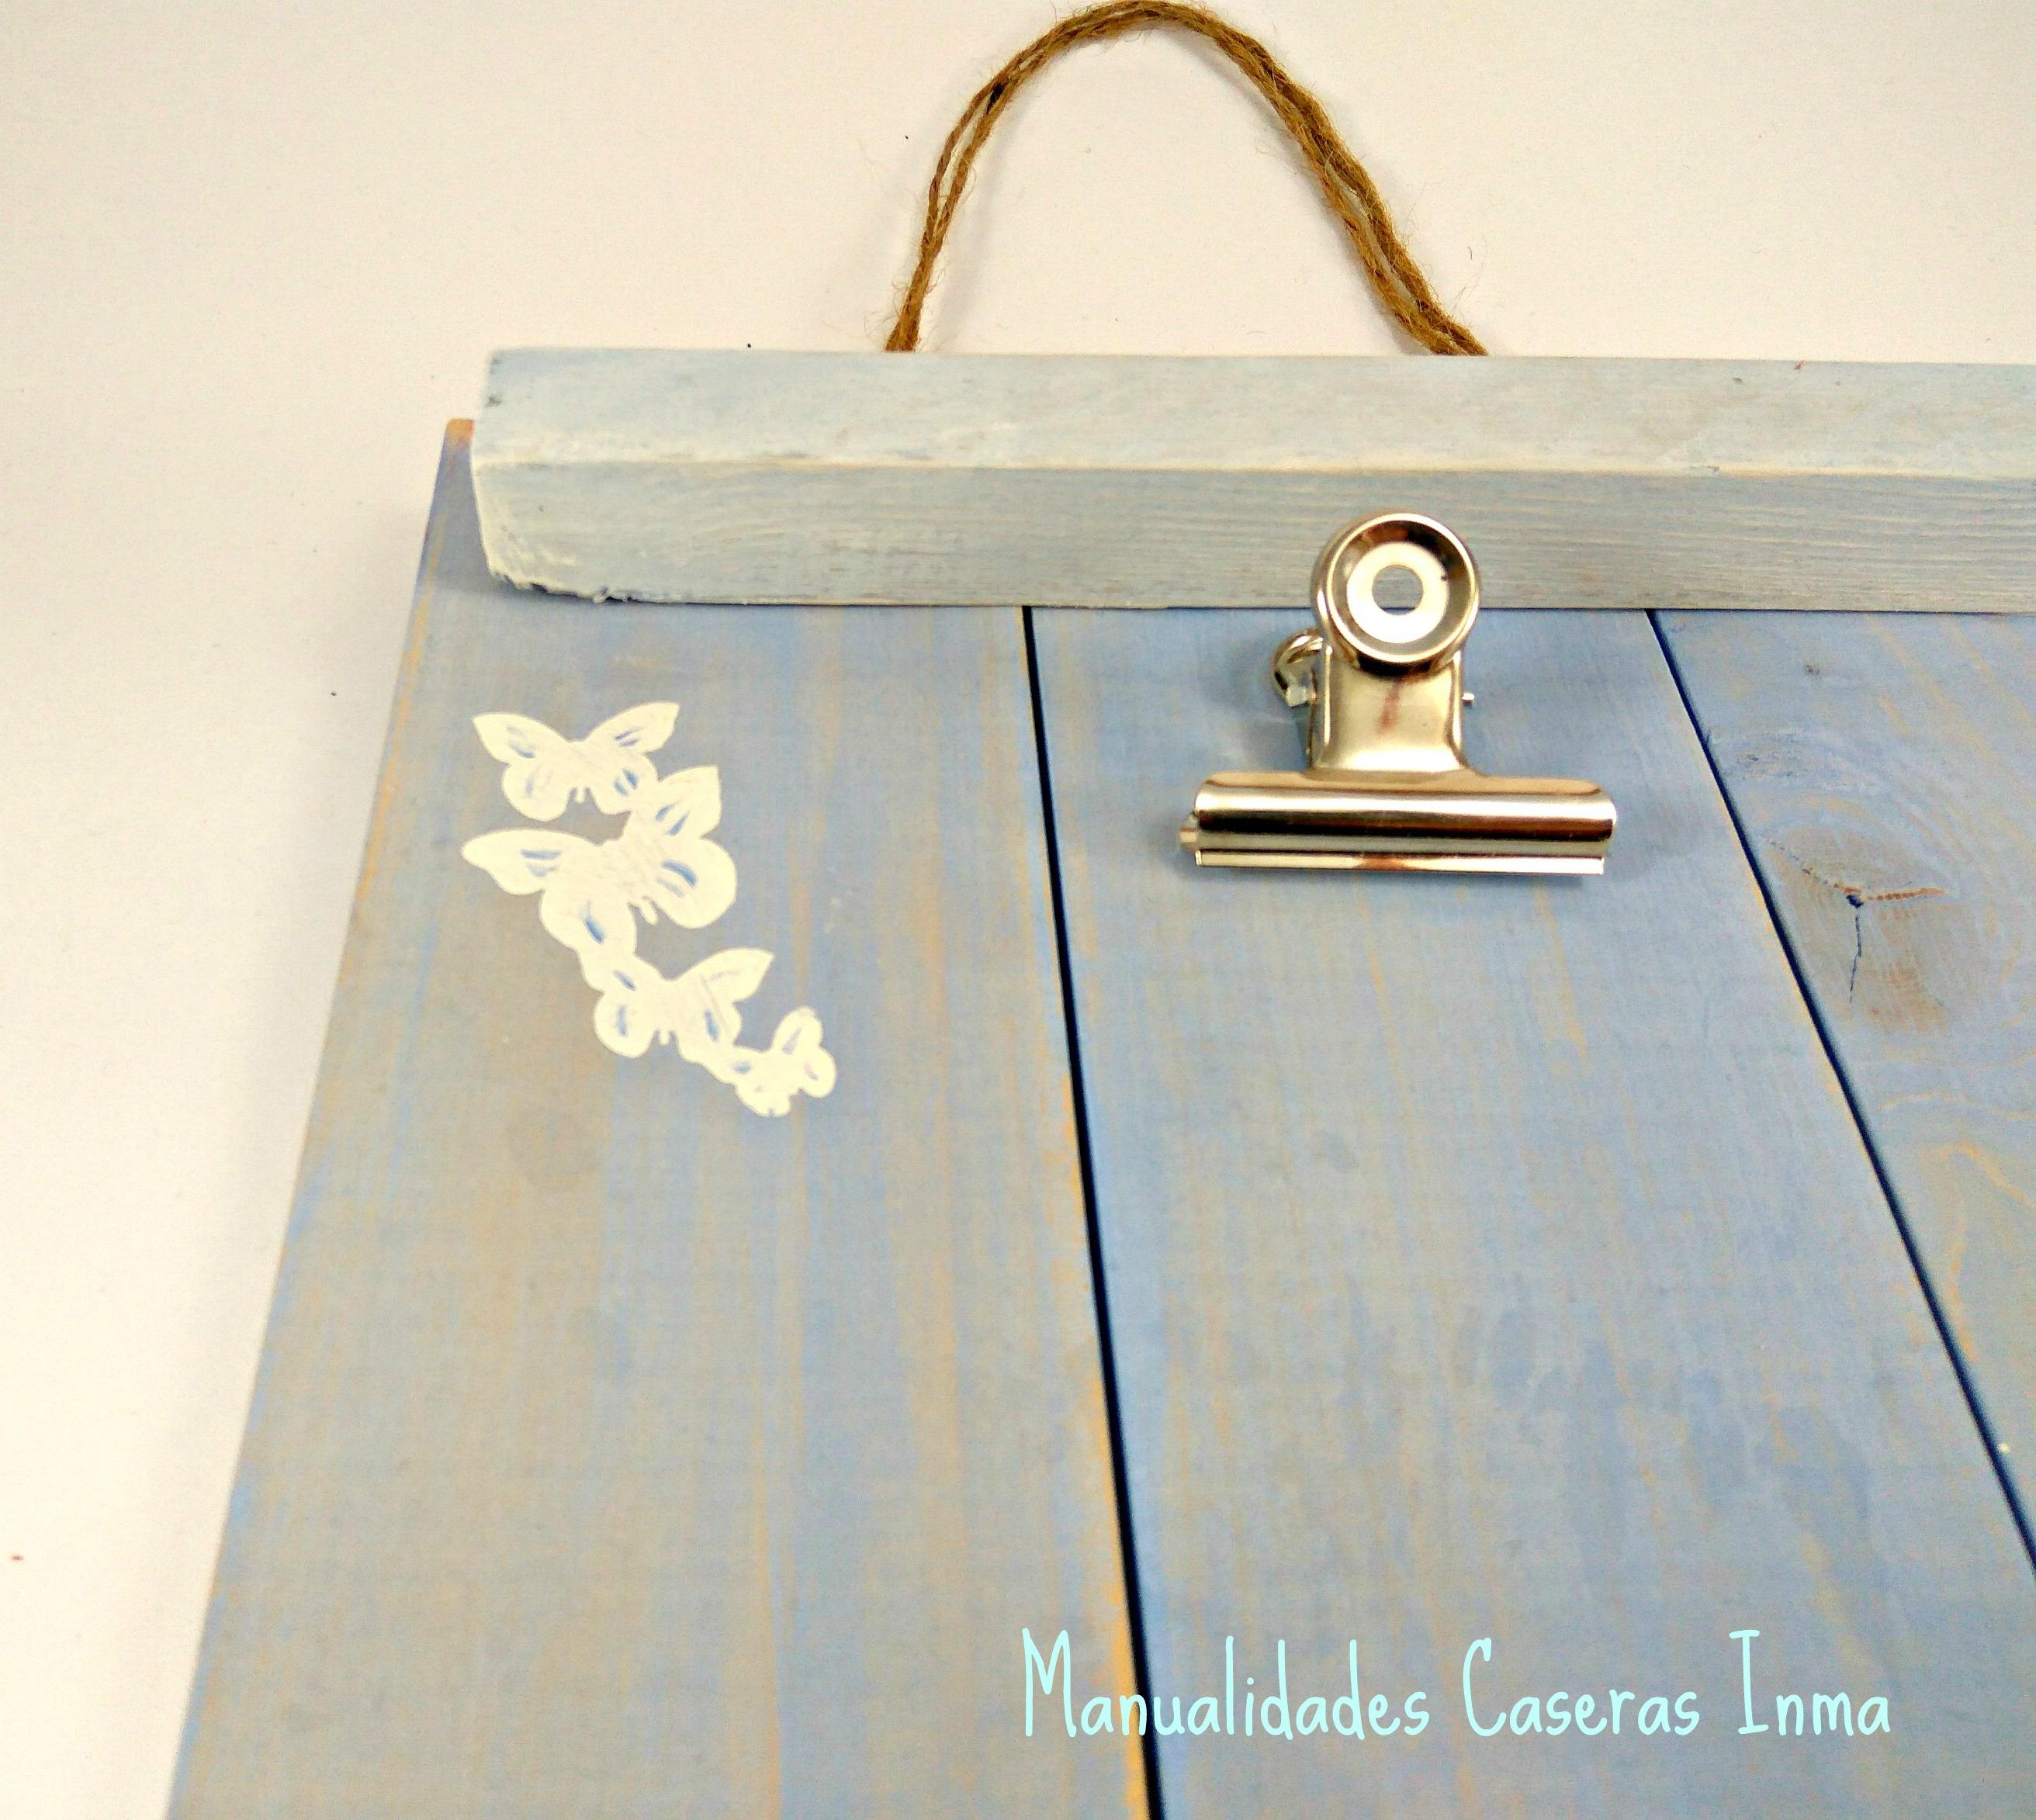 Manualidades Caseras Inma Portarretratos decorado con mariposas_Pintado de mariposas detalle